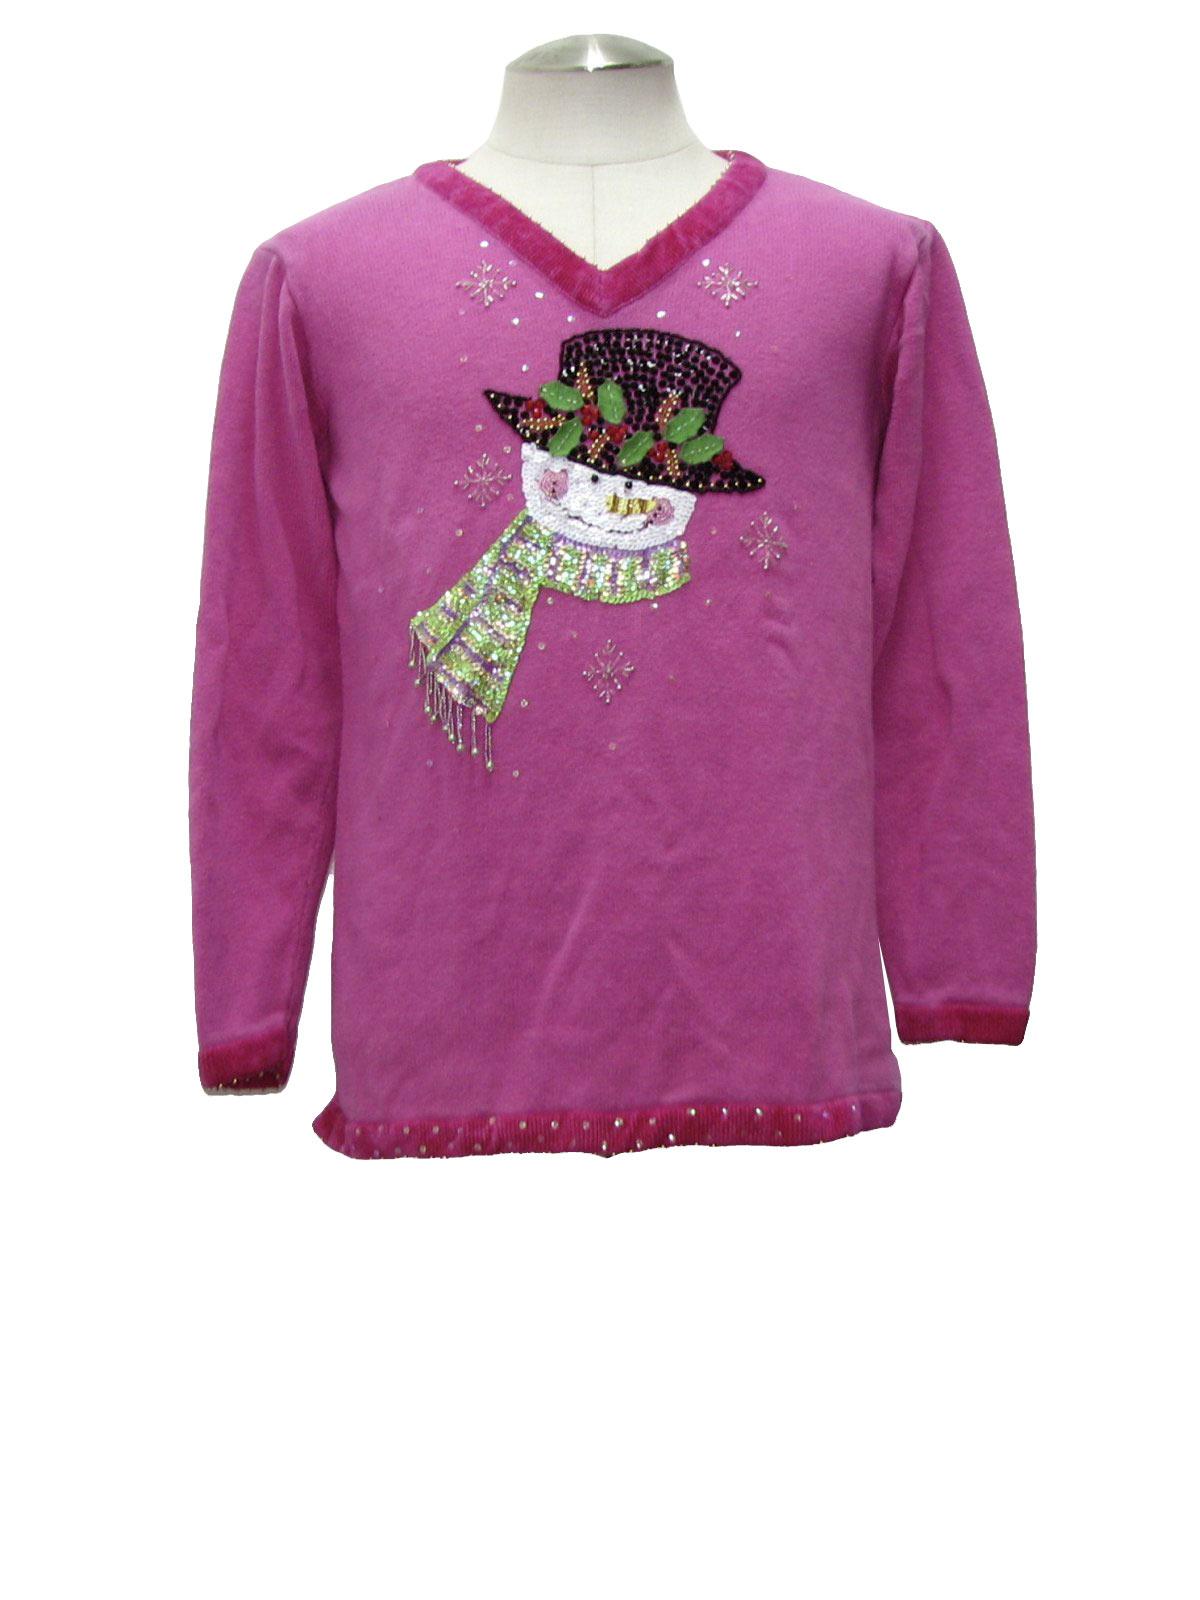 Quacker Factory Smirking Snowmen Tacky Ugly Christmas Sweater - L/XL